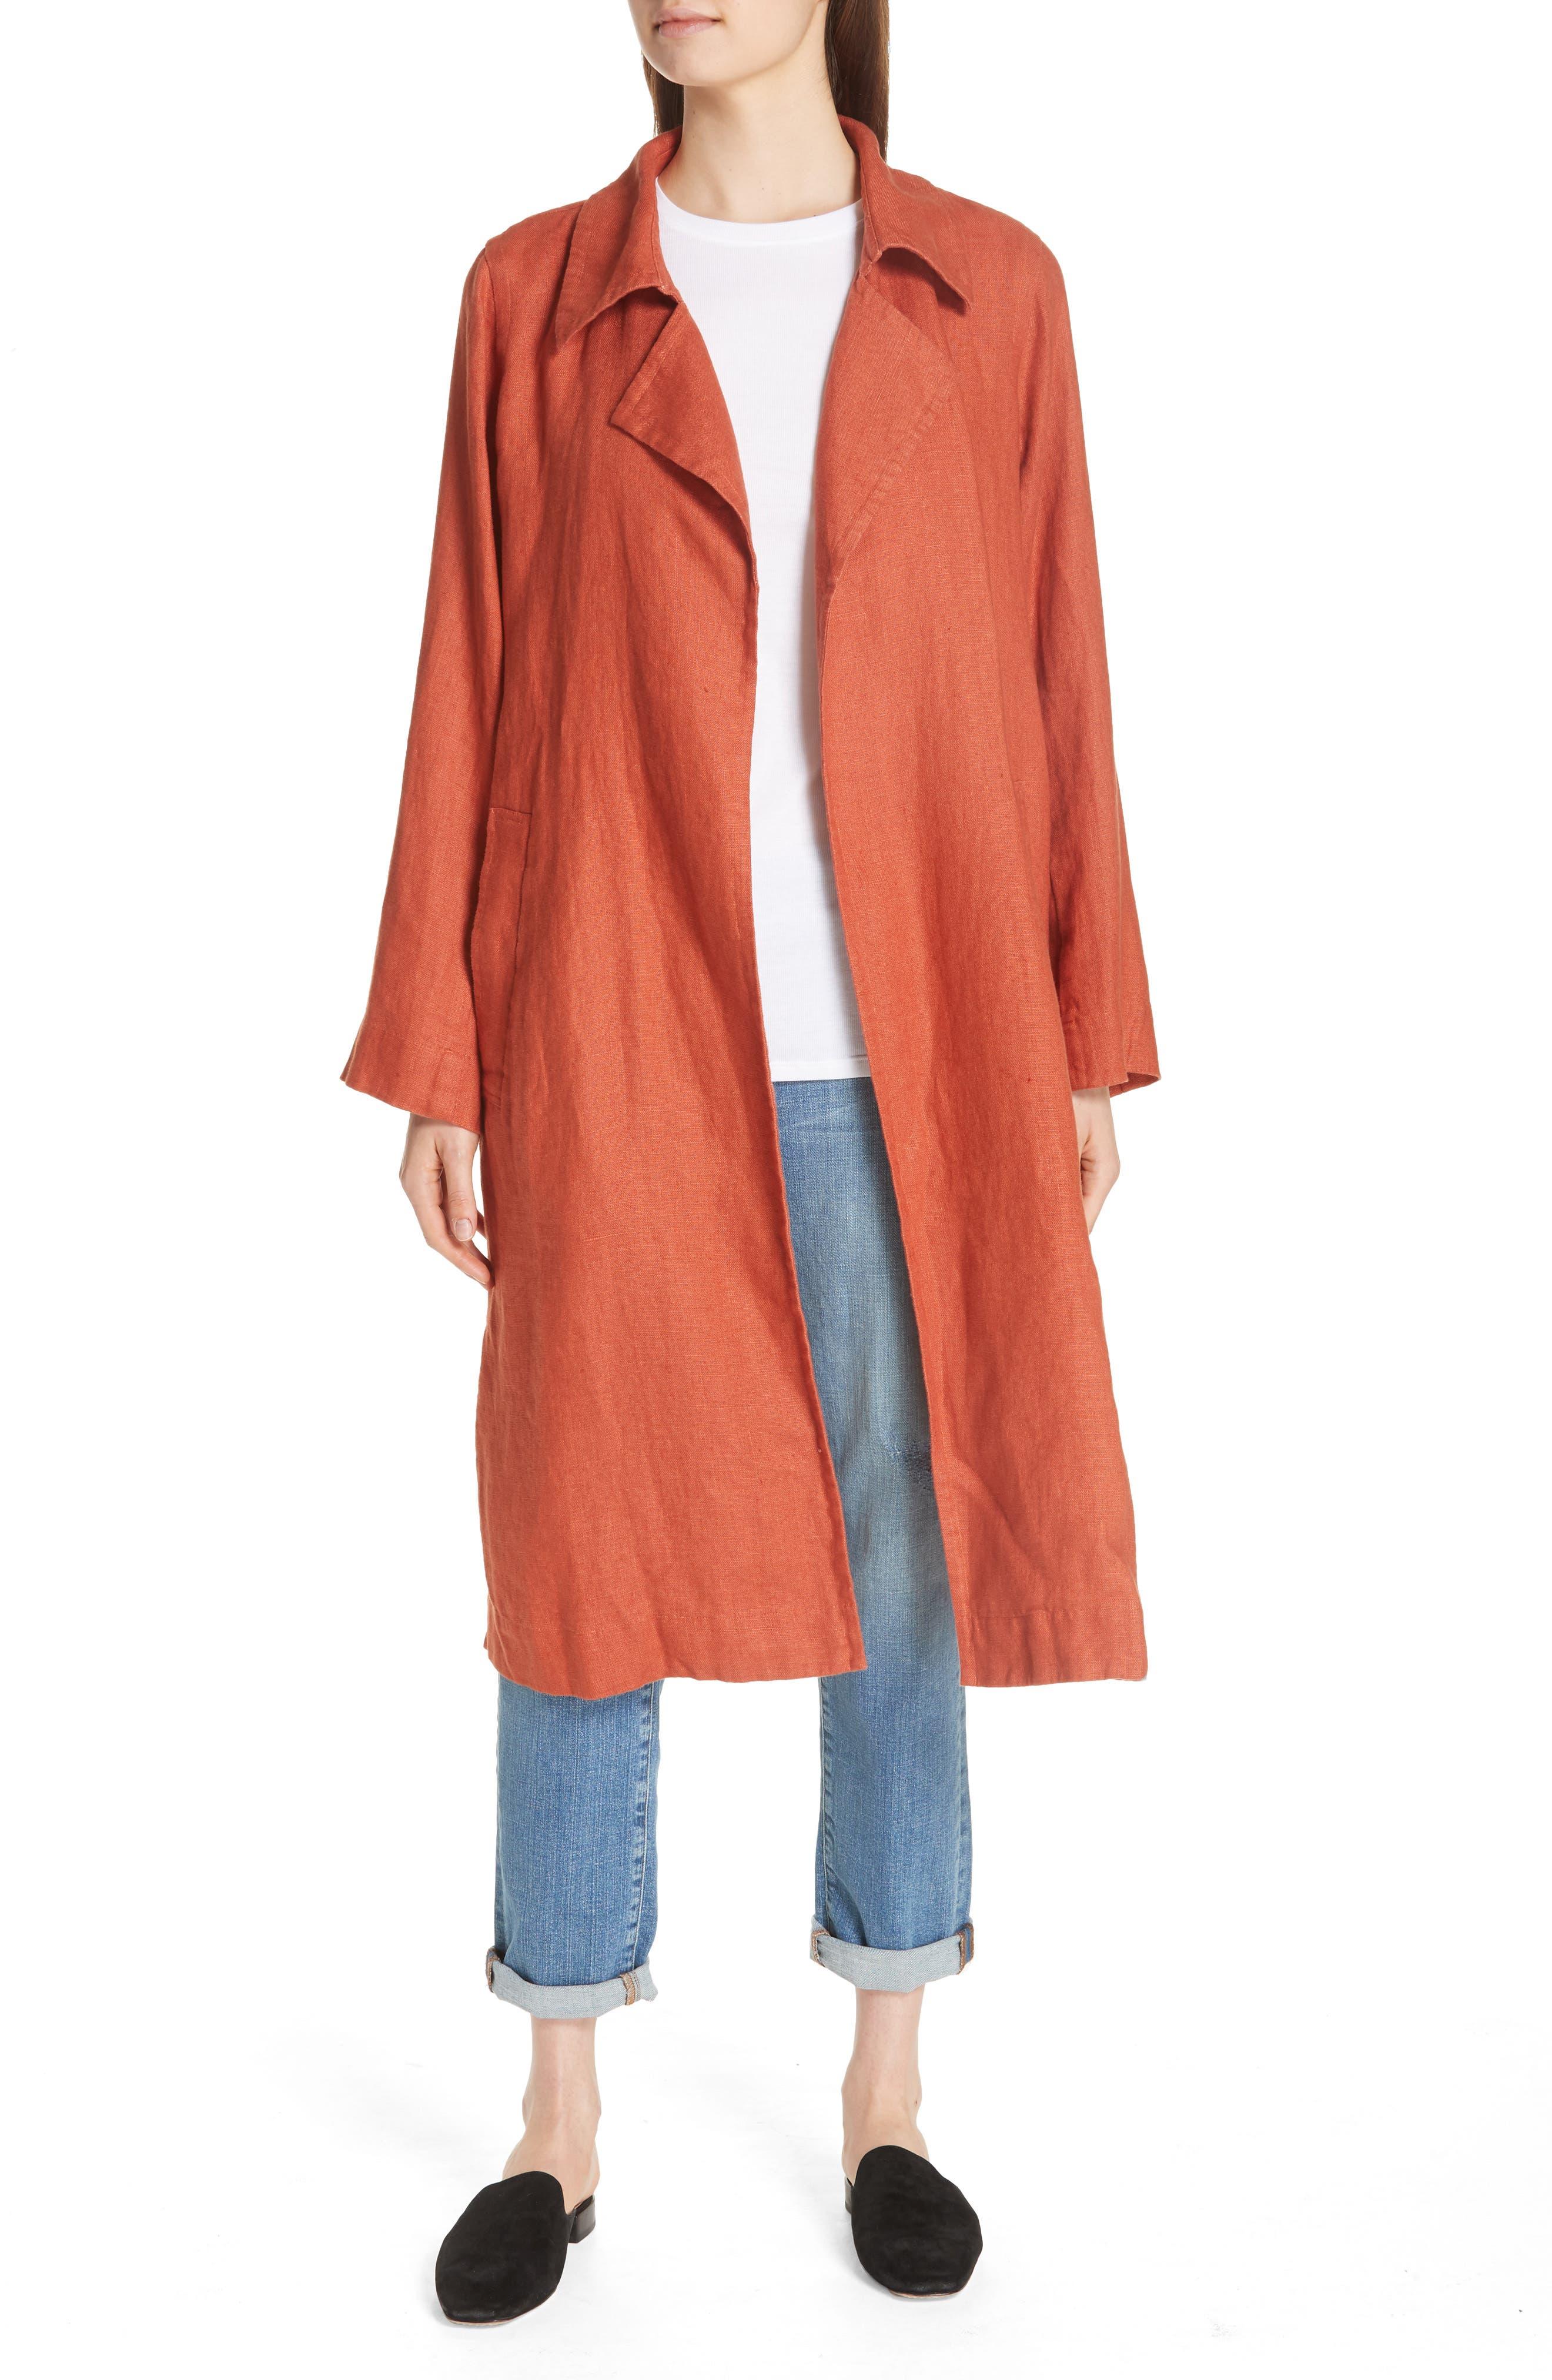 Organic Linen Trench Coat,                             Alternate thumbnail 7, color,                             822